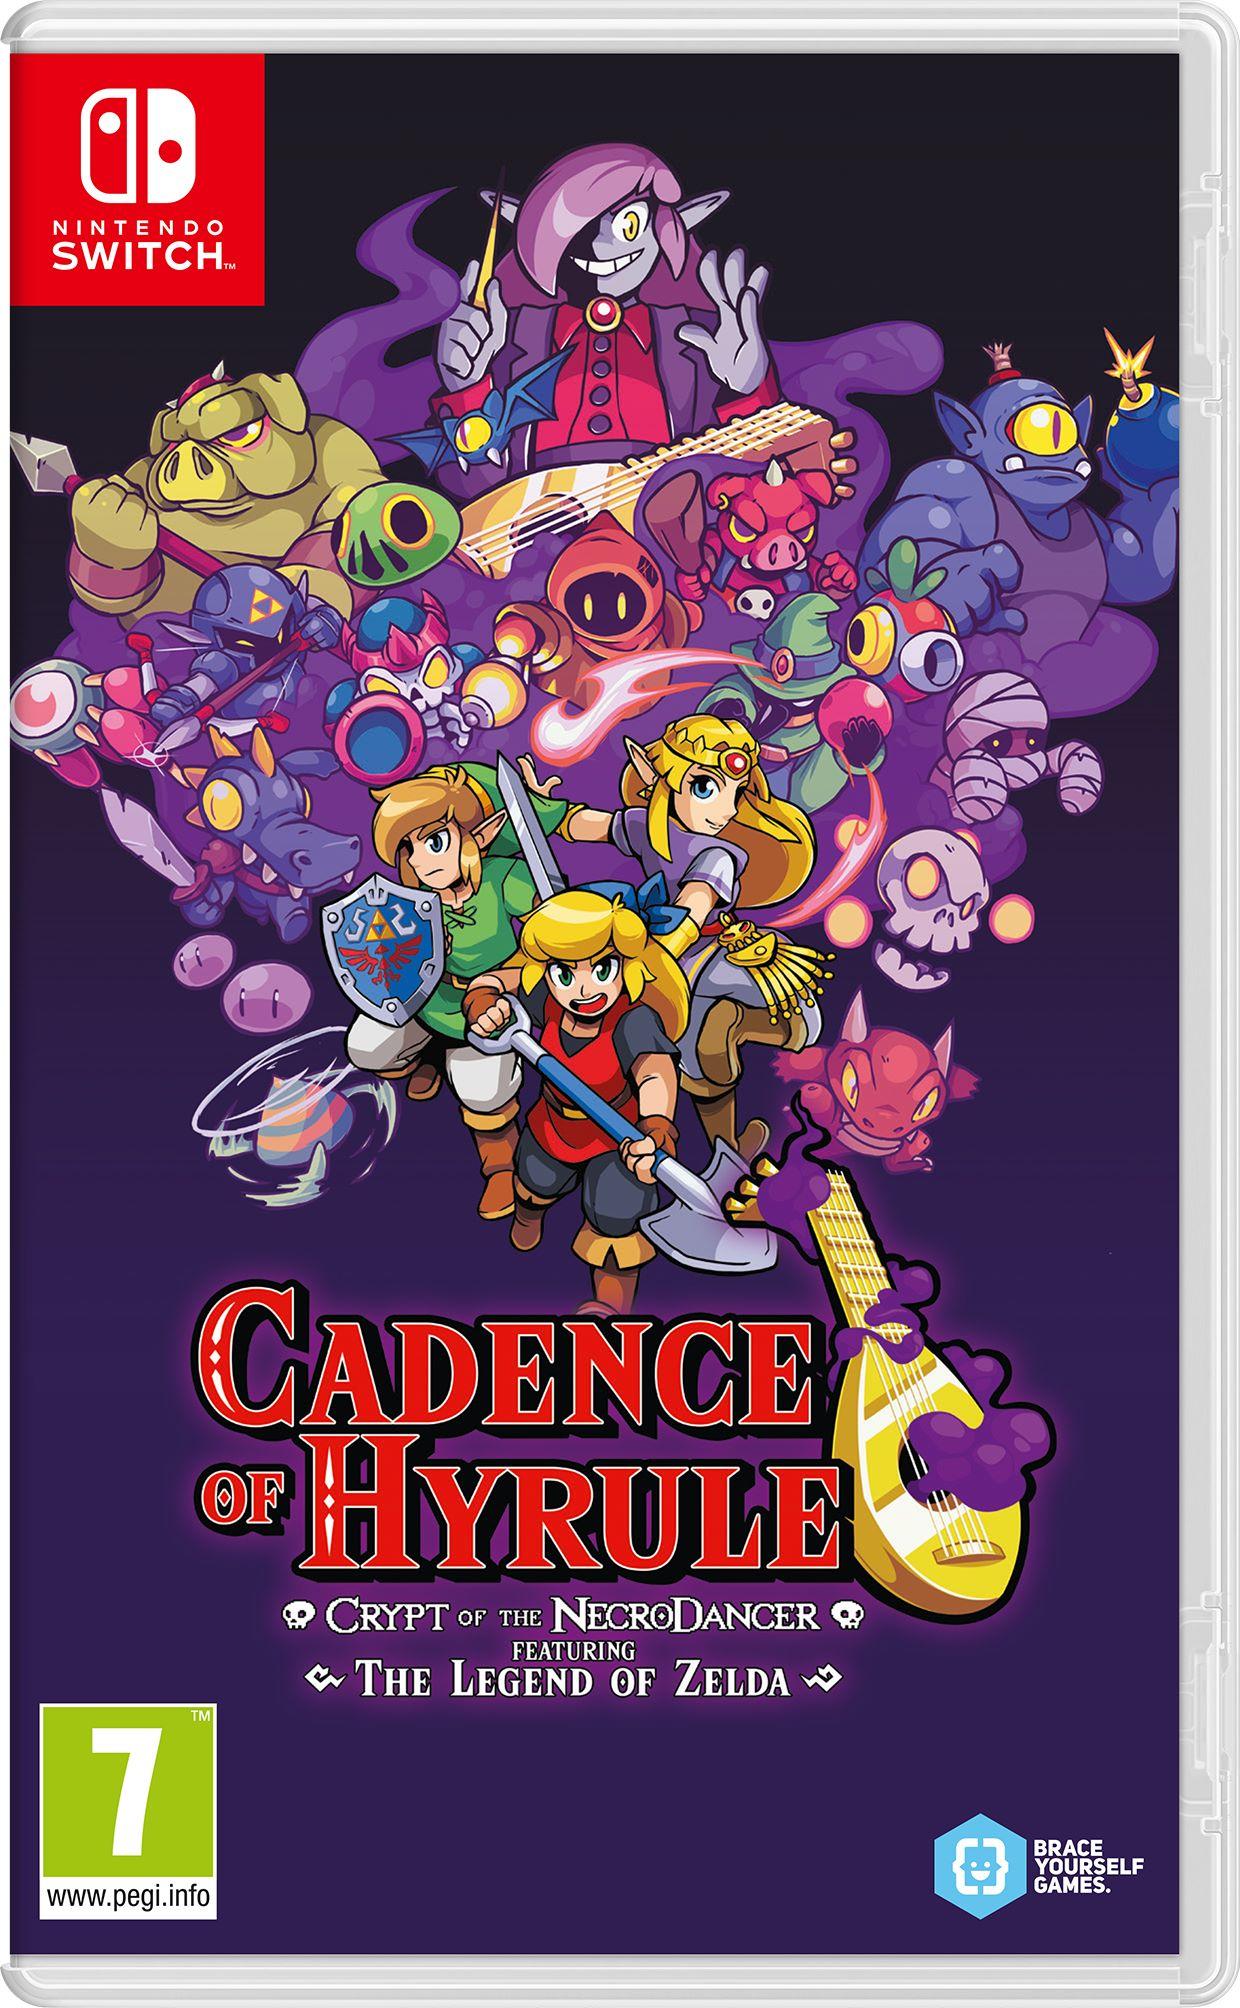 Cadence of Hyrule - Crypt of the NecroDancer Featuring The Legend of Zelda  è ora disponibile in edizione fisica - GamingTalker